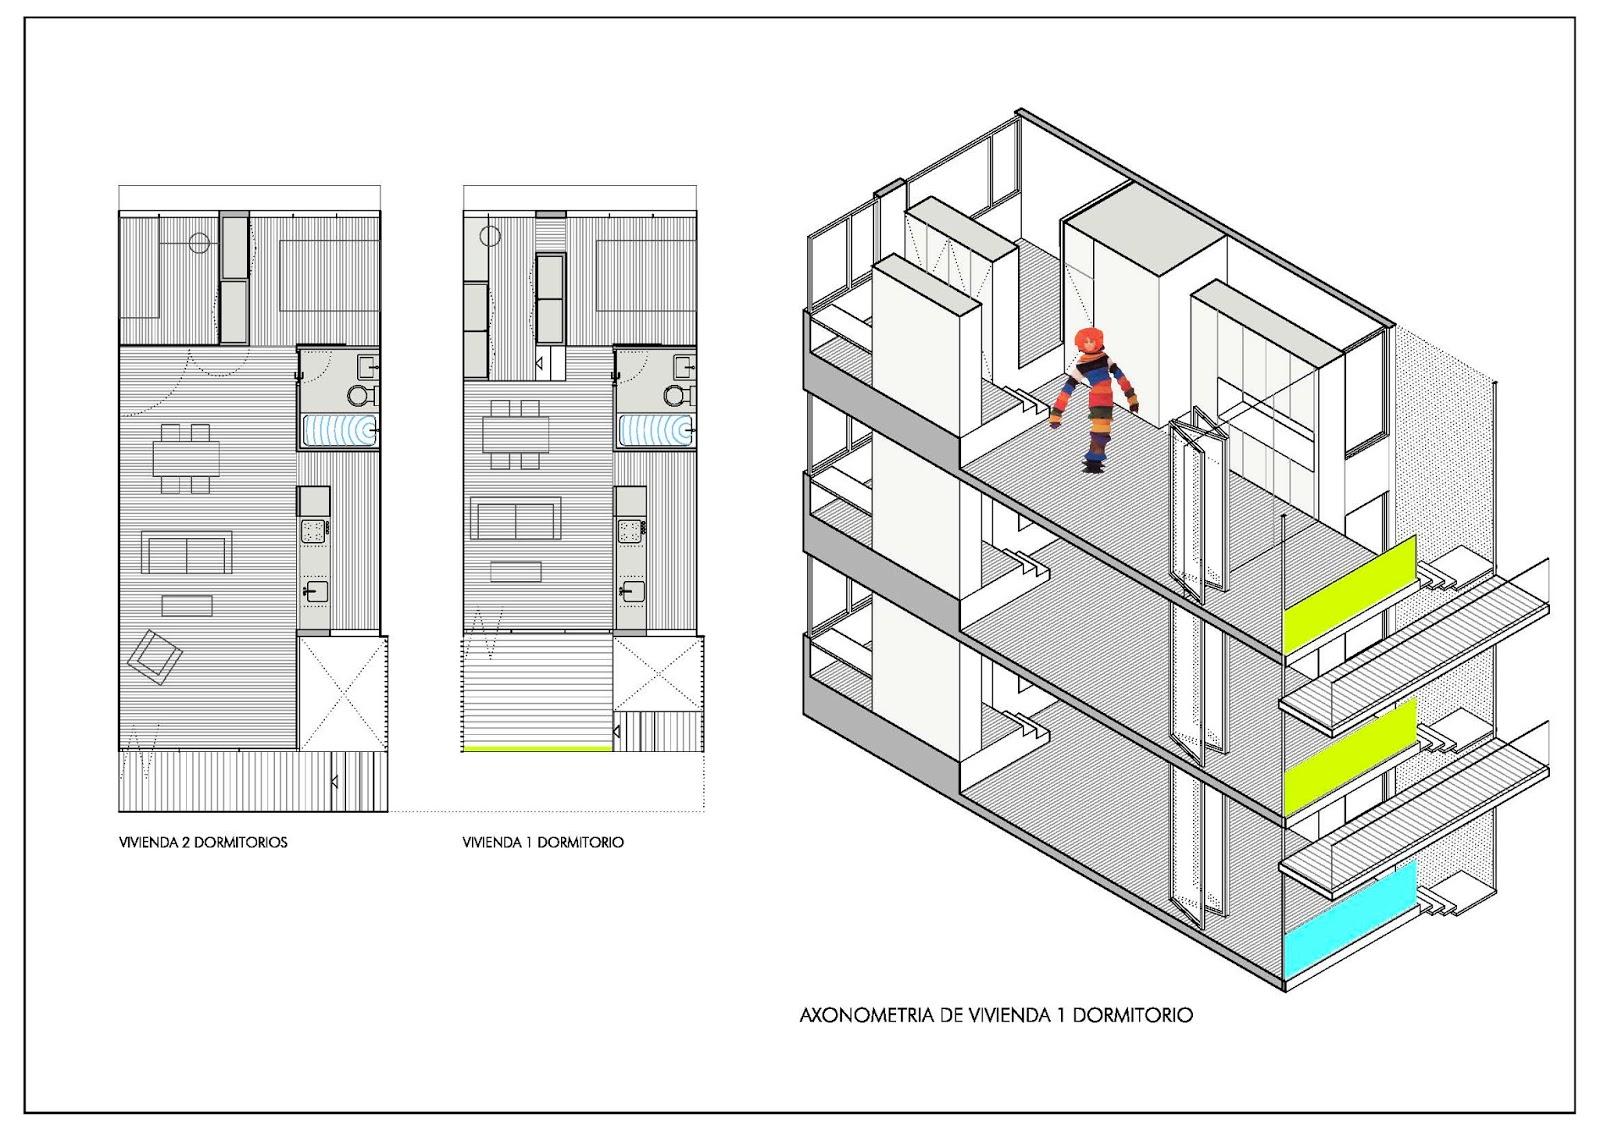 Beriot bernardini arquitectos concurso de viviendas para for Vivienda interior